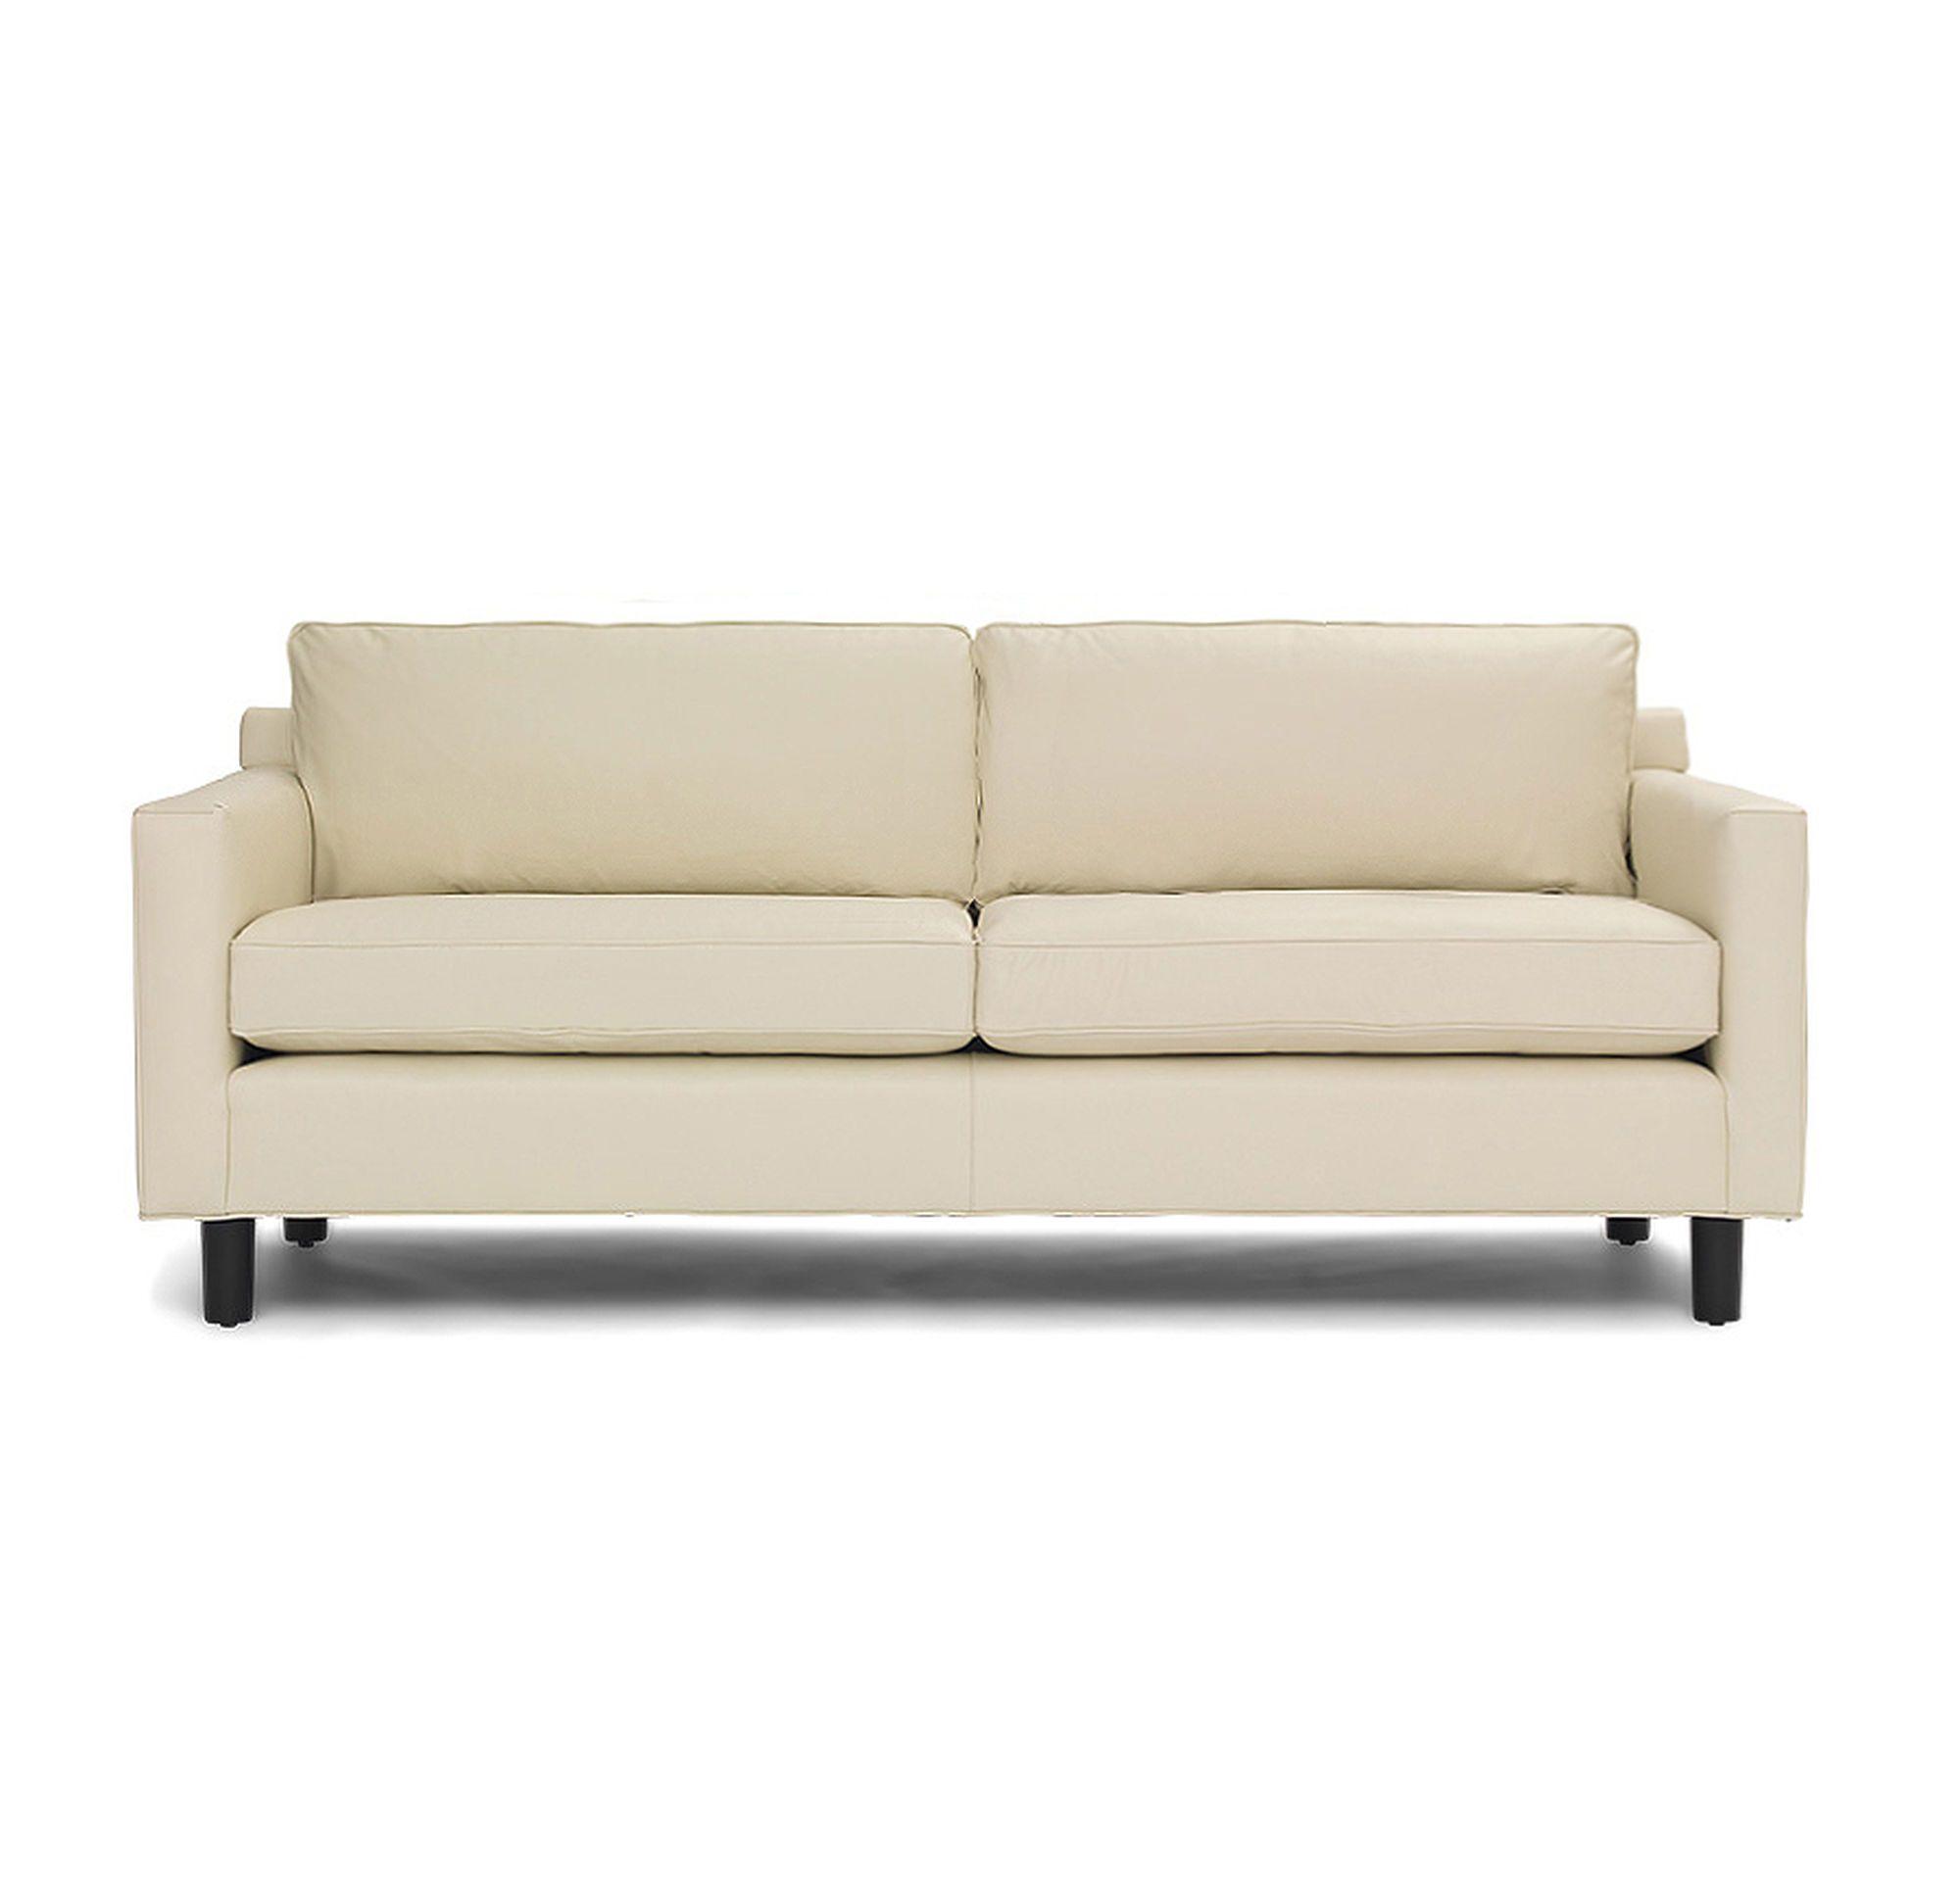 Cool Studio Sofa , Fancy Studio Sofa 37 For Contemporary Sofa Inspiration  With Studio Sofa ,